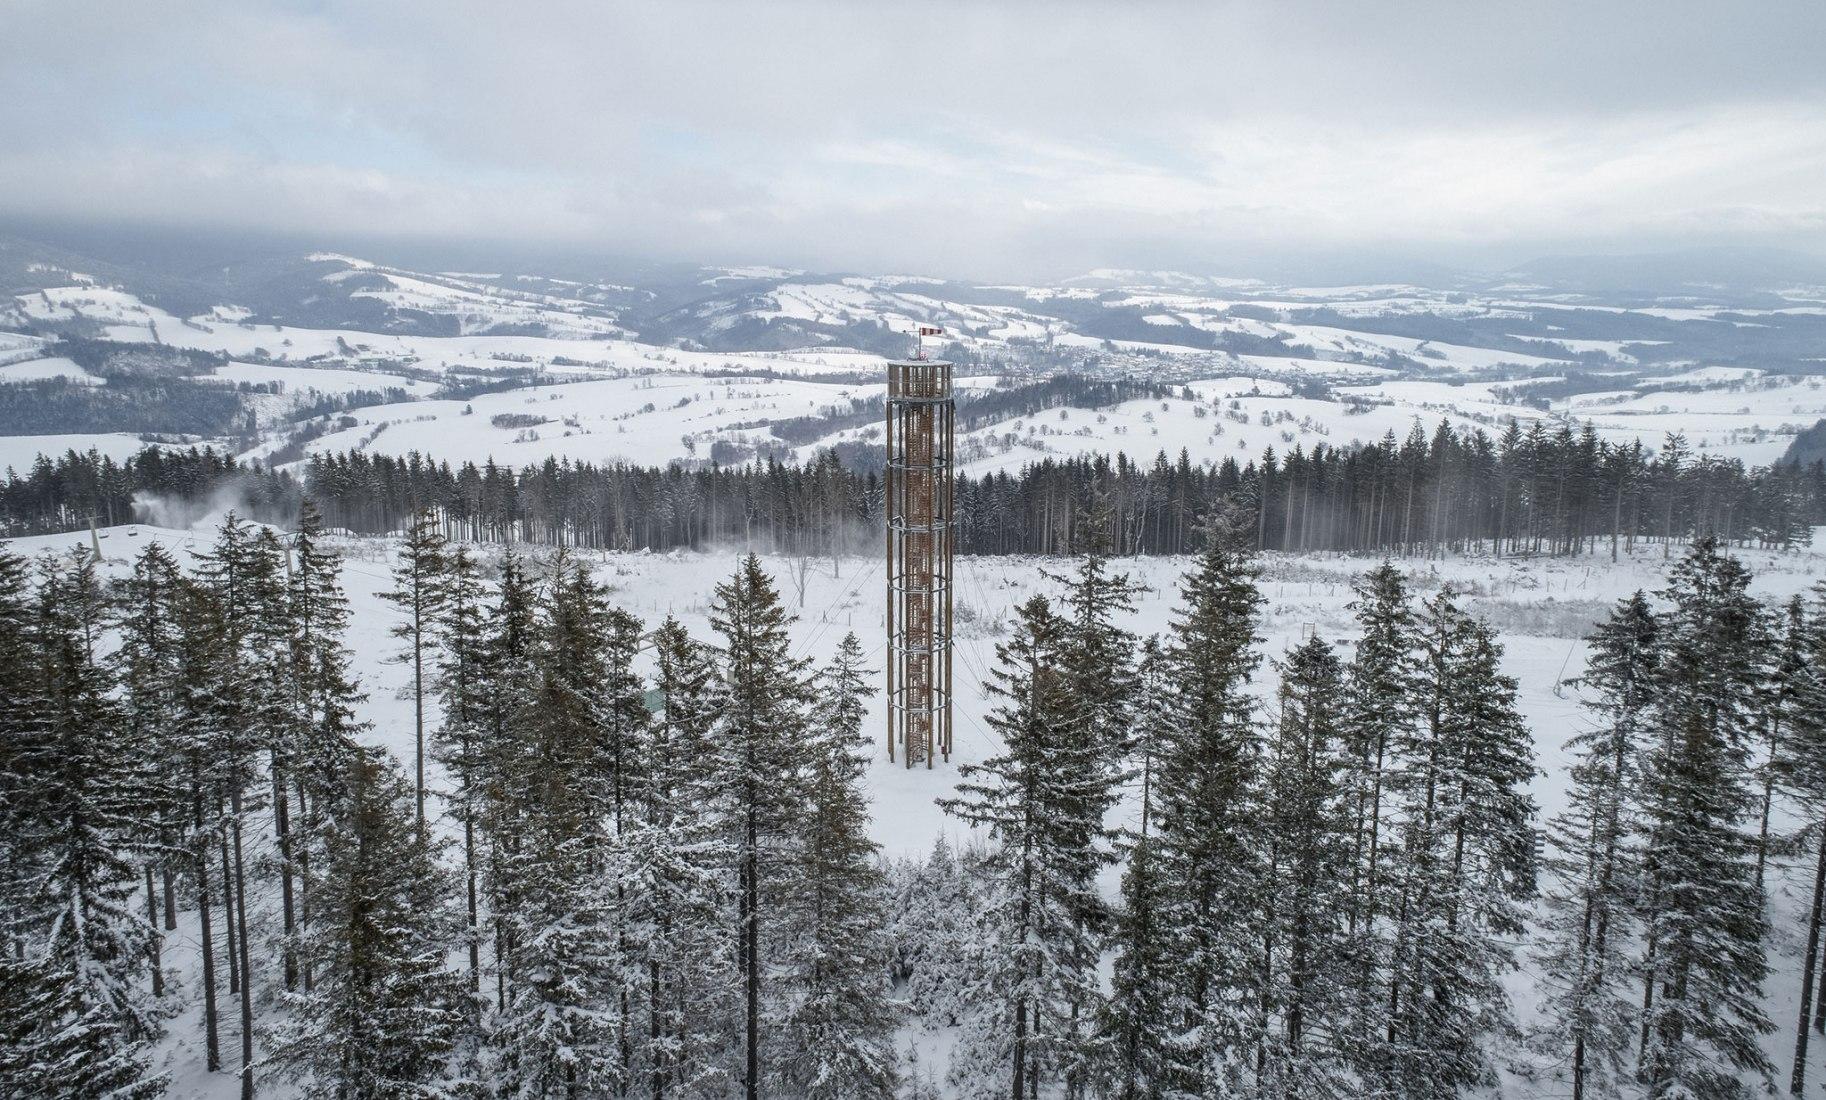 Lookout Tower at Kraličák by David Kubík. Photograph by Jakub Skokan, Martin Tůma / BoysPlayNice